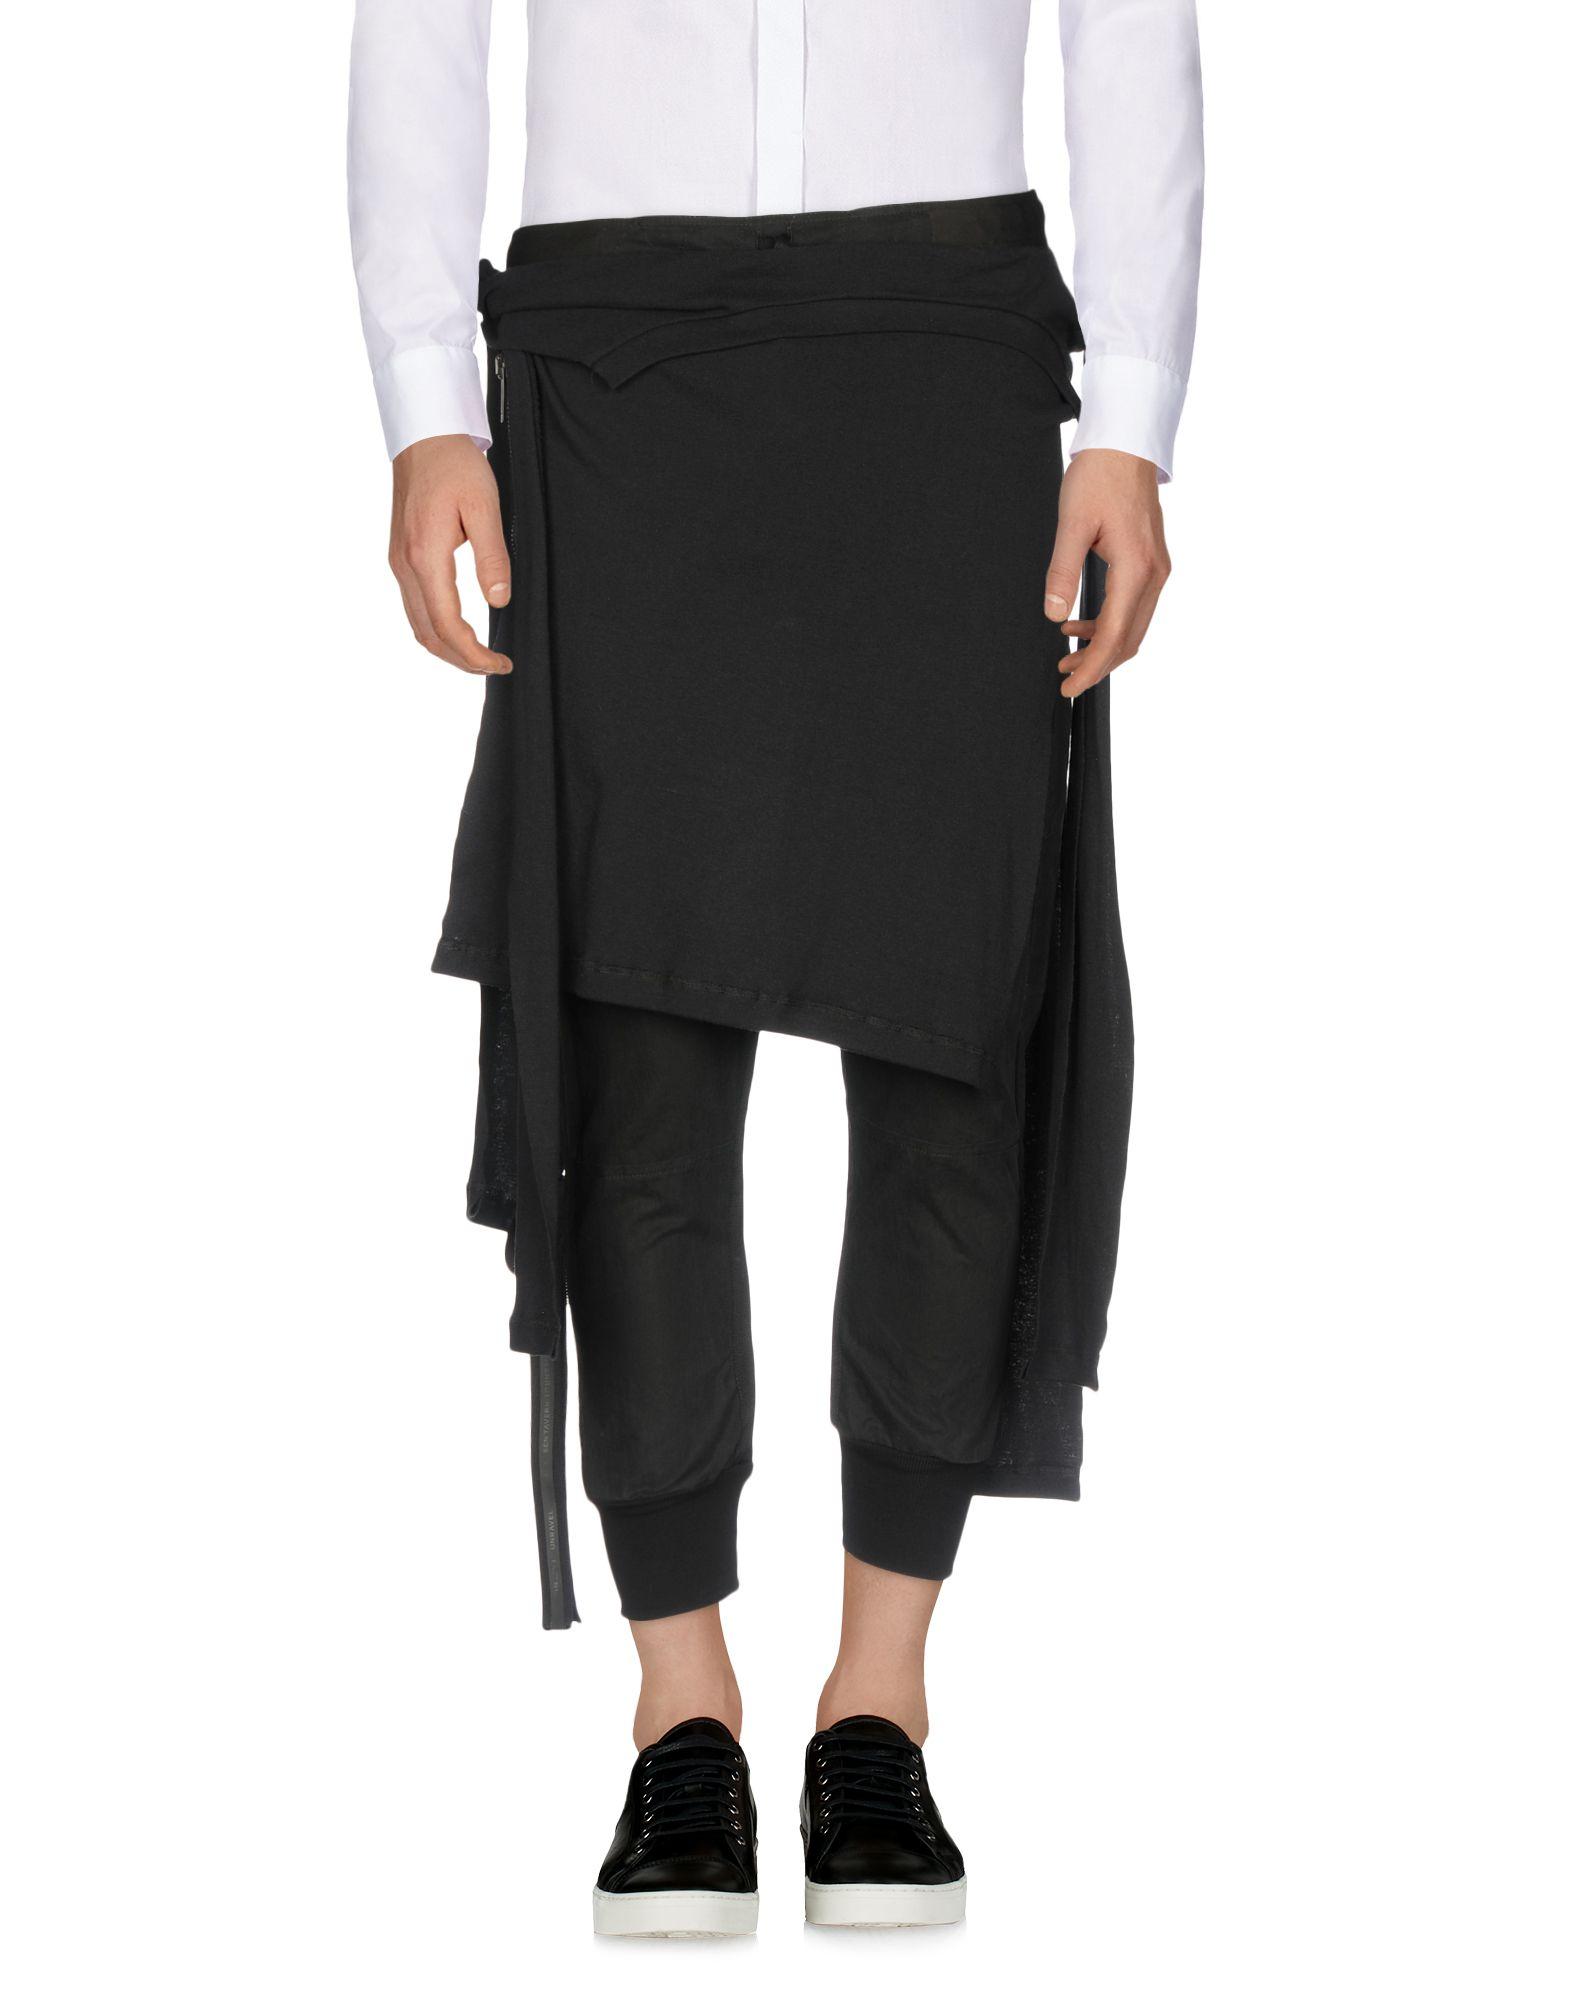 BEN TAVERNITI™ UNRAVEL PROJECT Повседневные брюки ben taverniti™ unravel project повседневные брюки